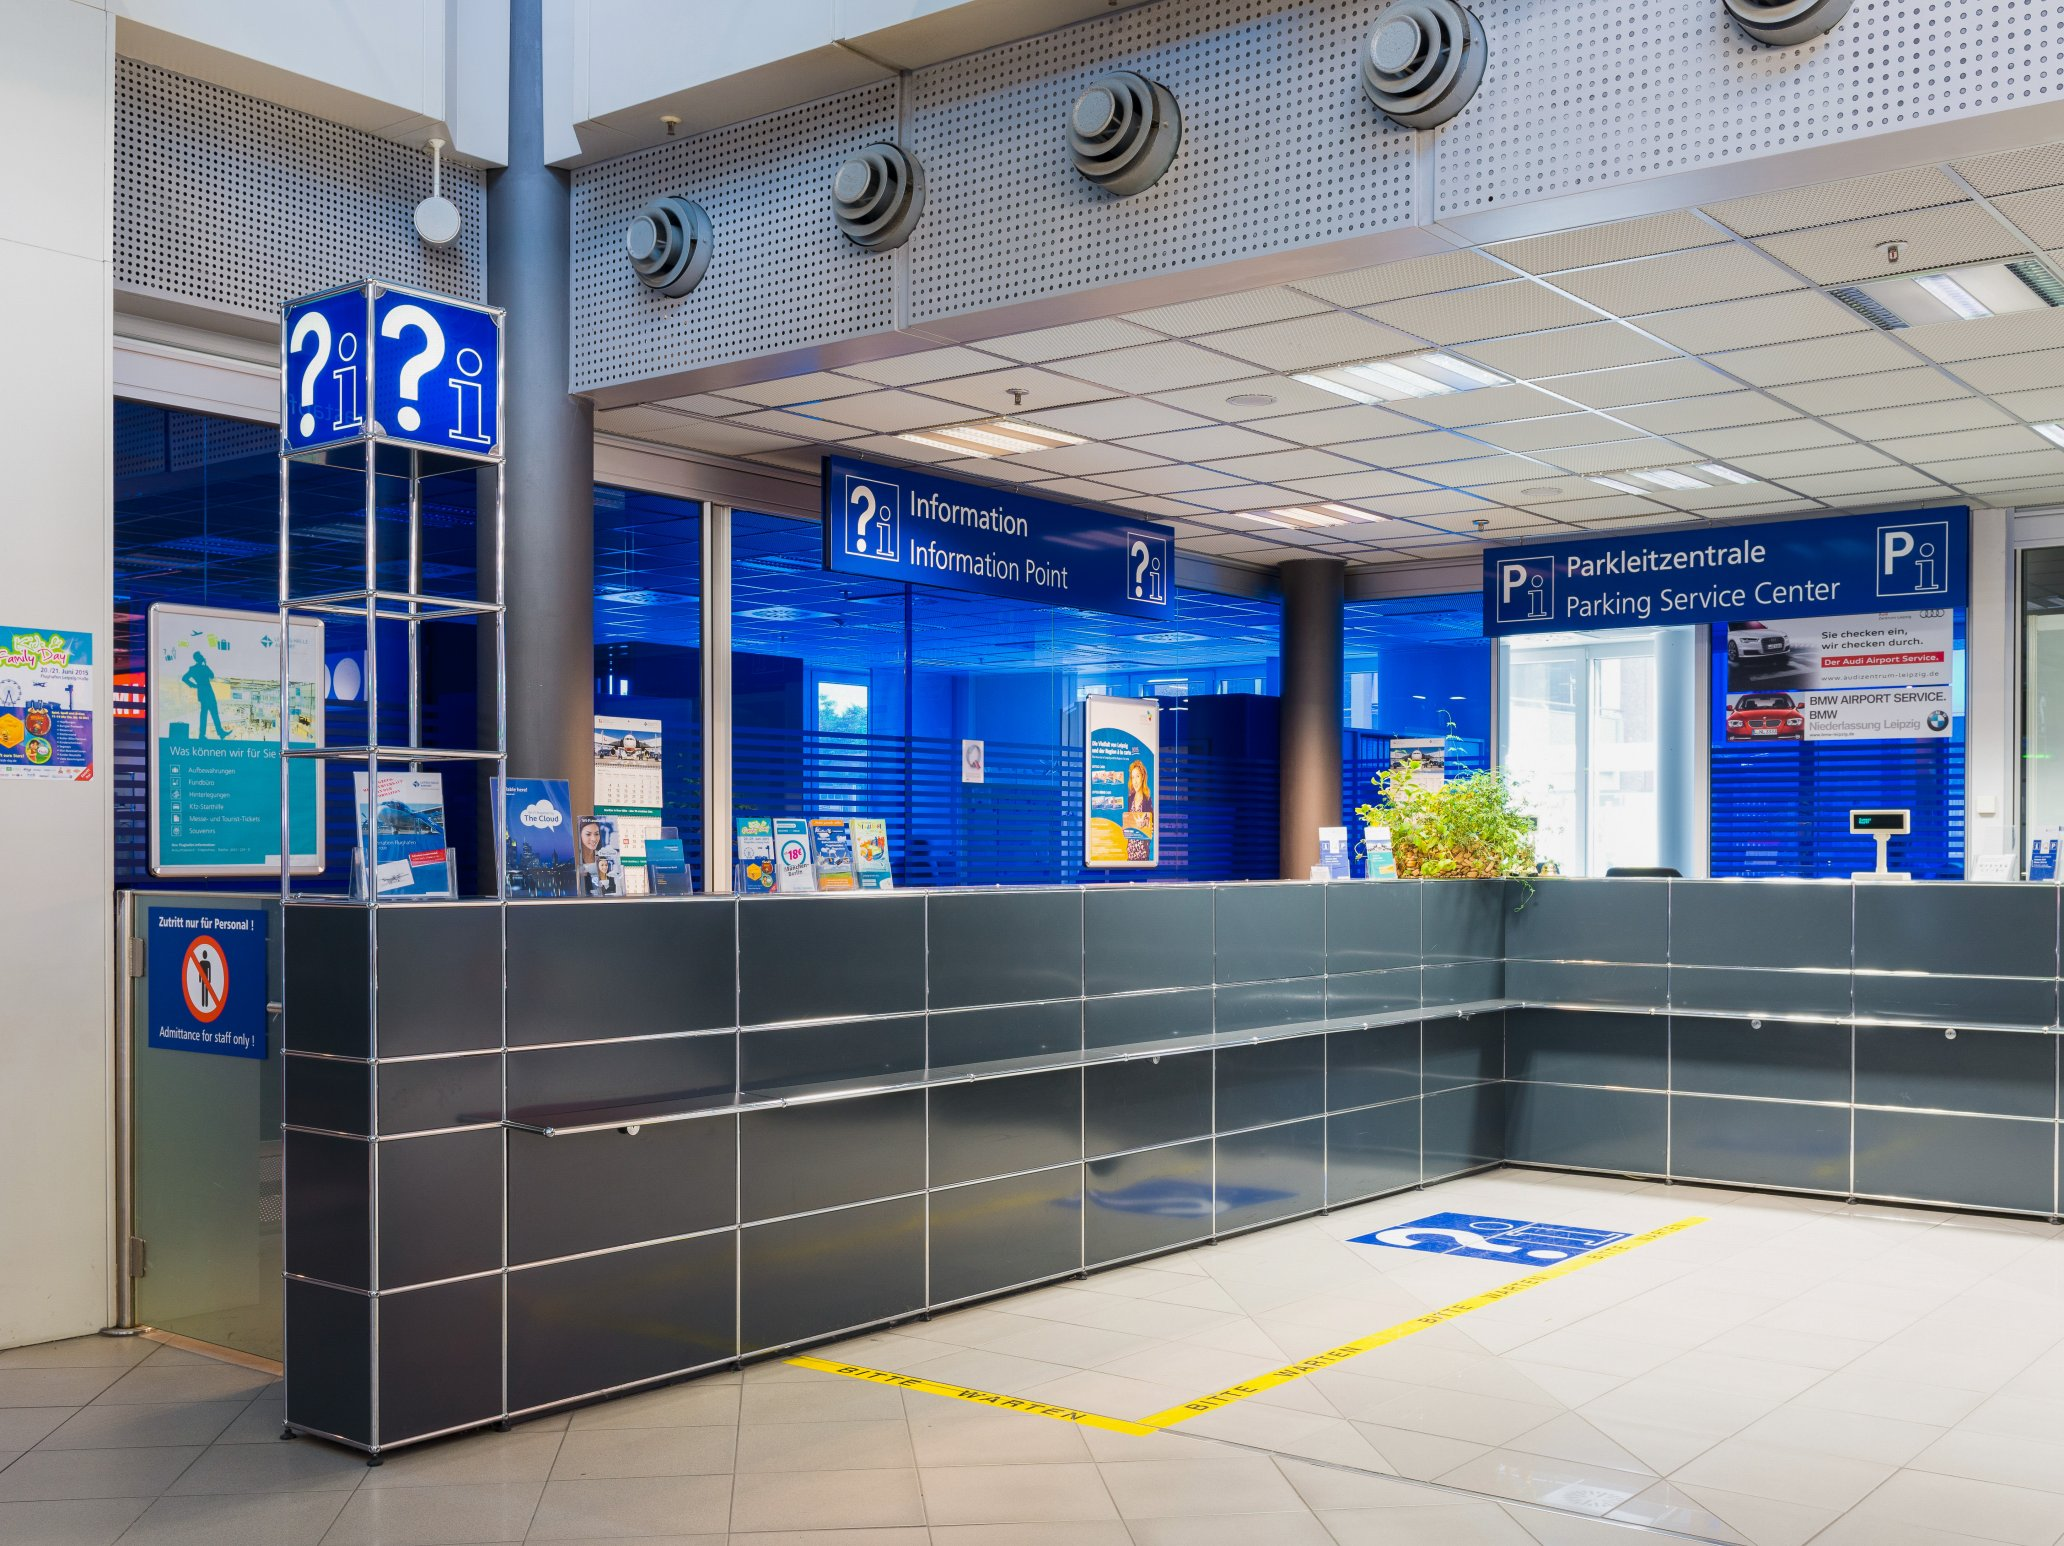 USM Airport Halle-Leipzig Information